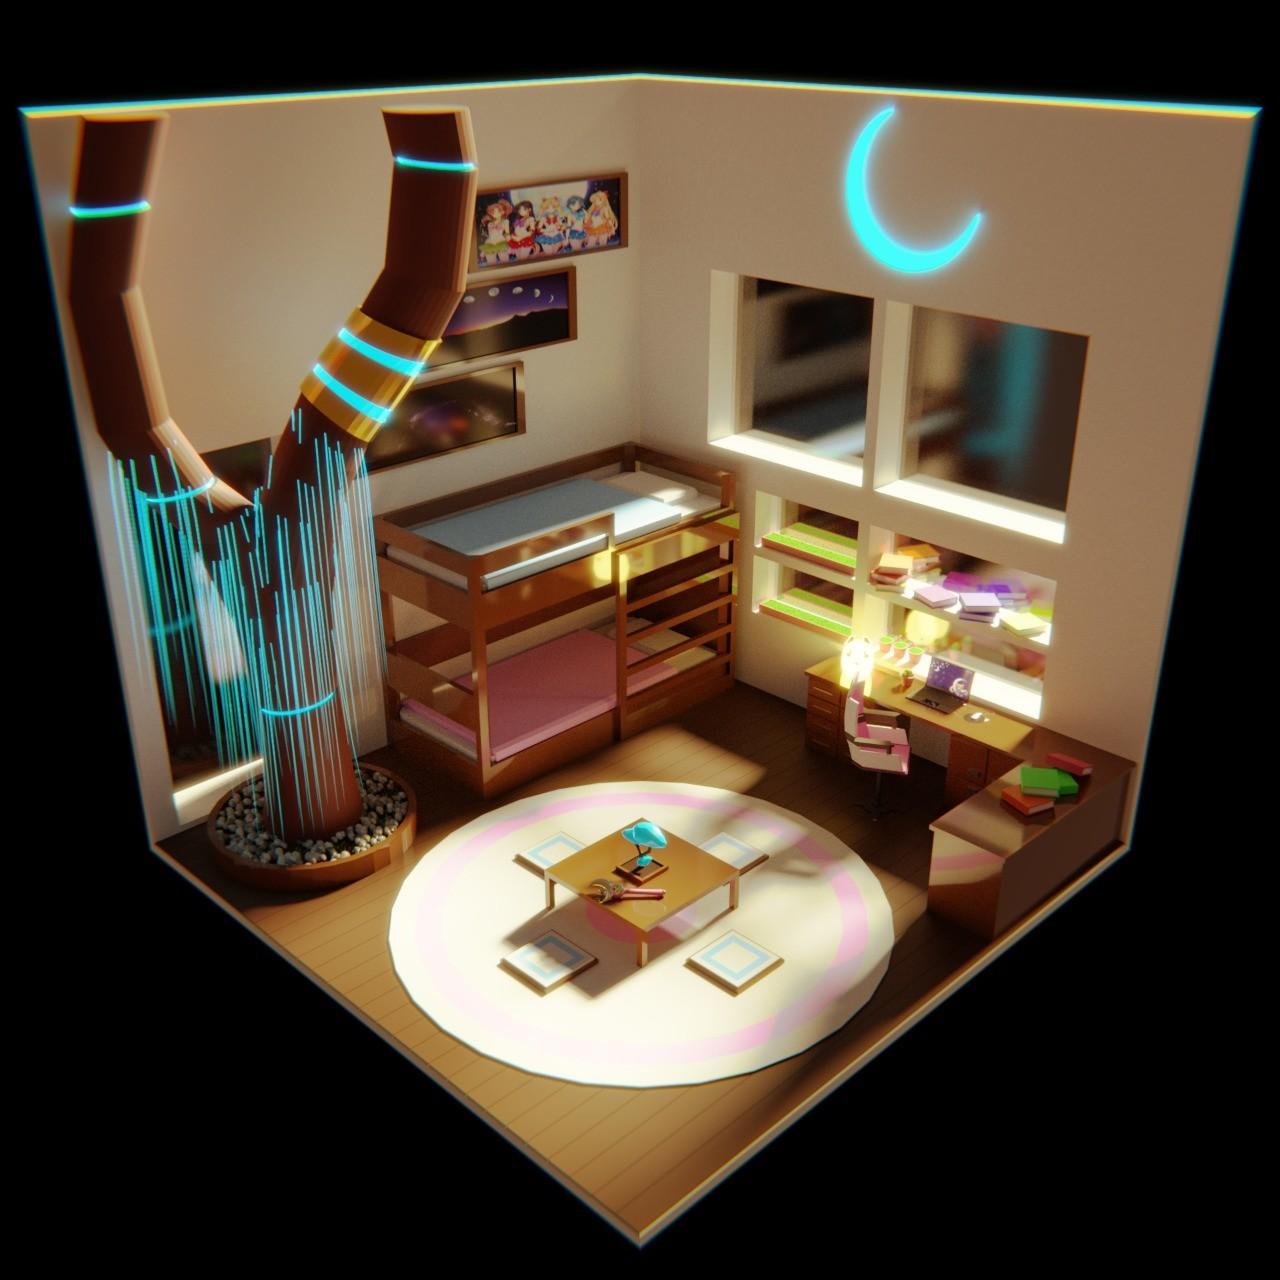 William Pereira Low Poly Bedroom